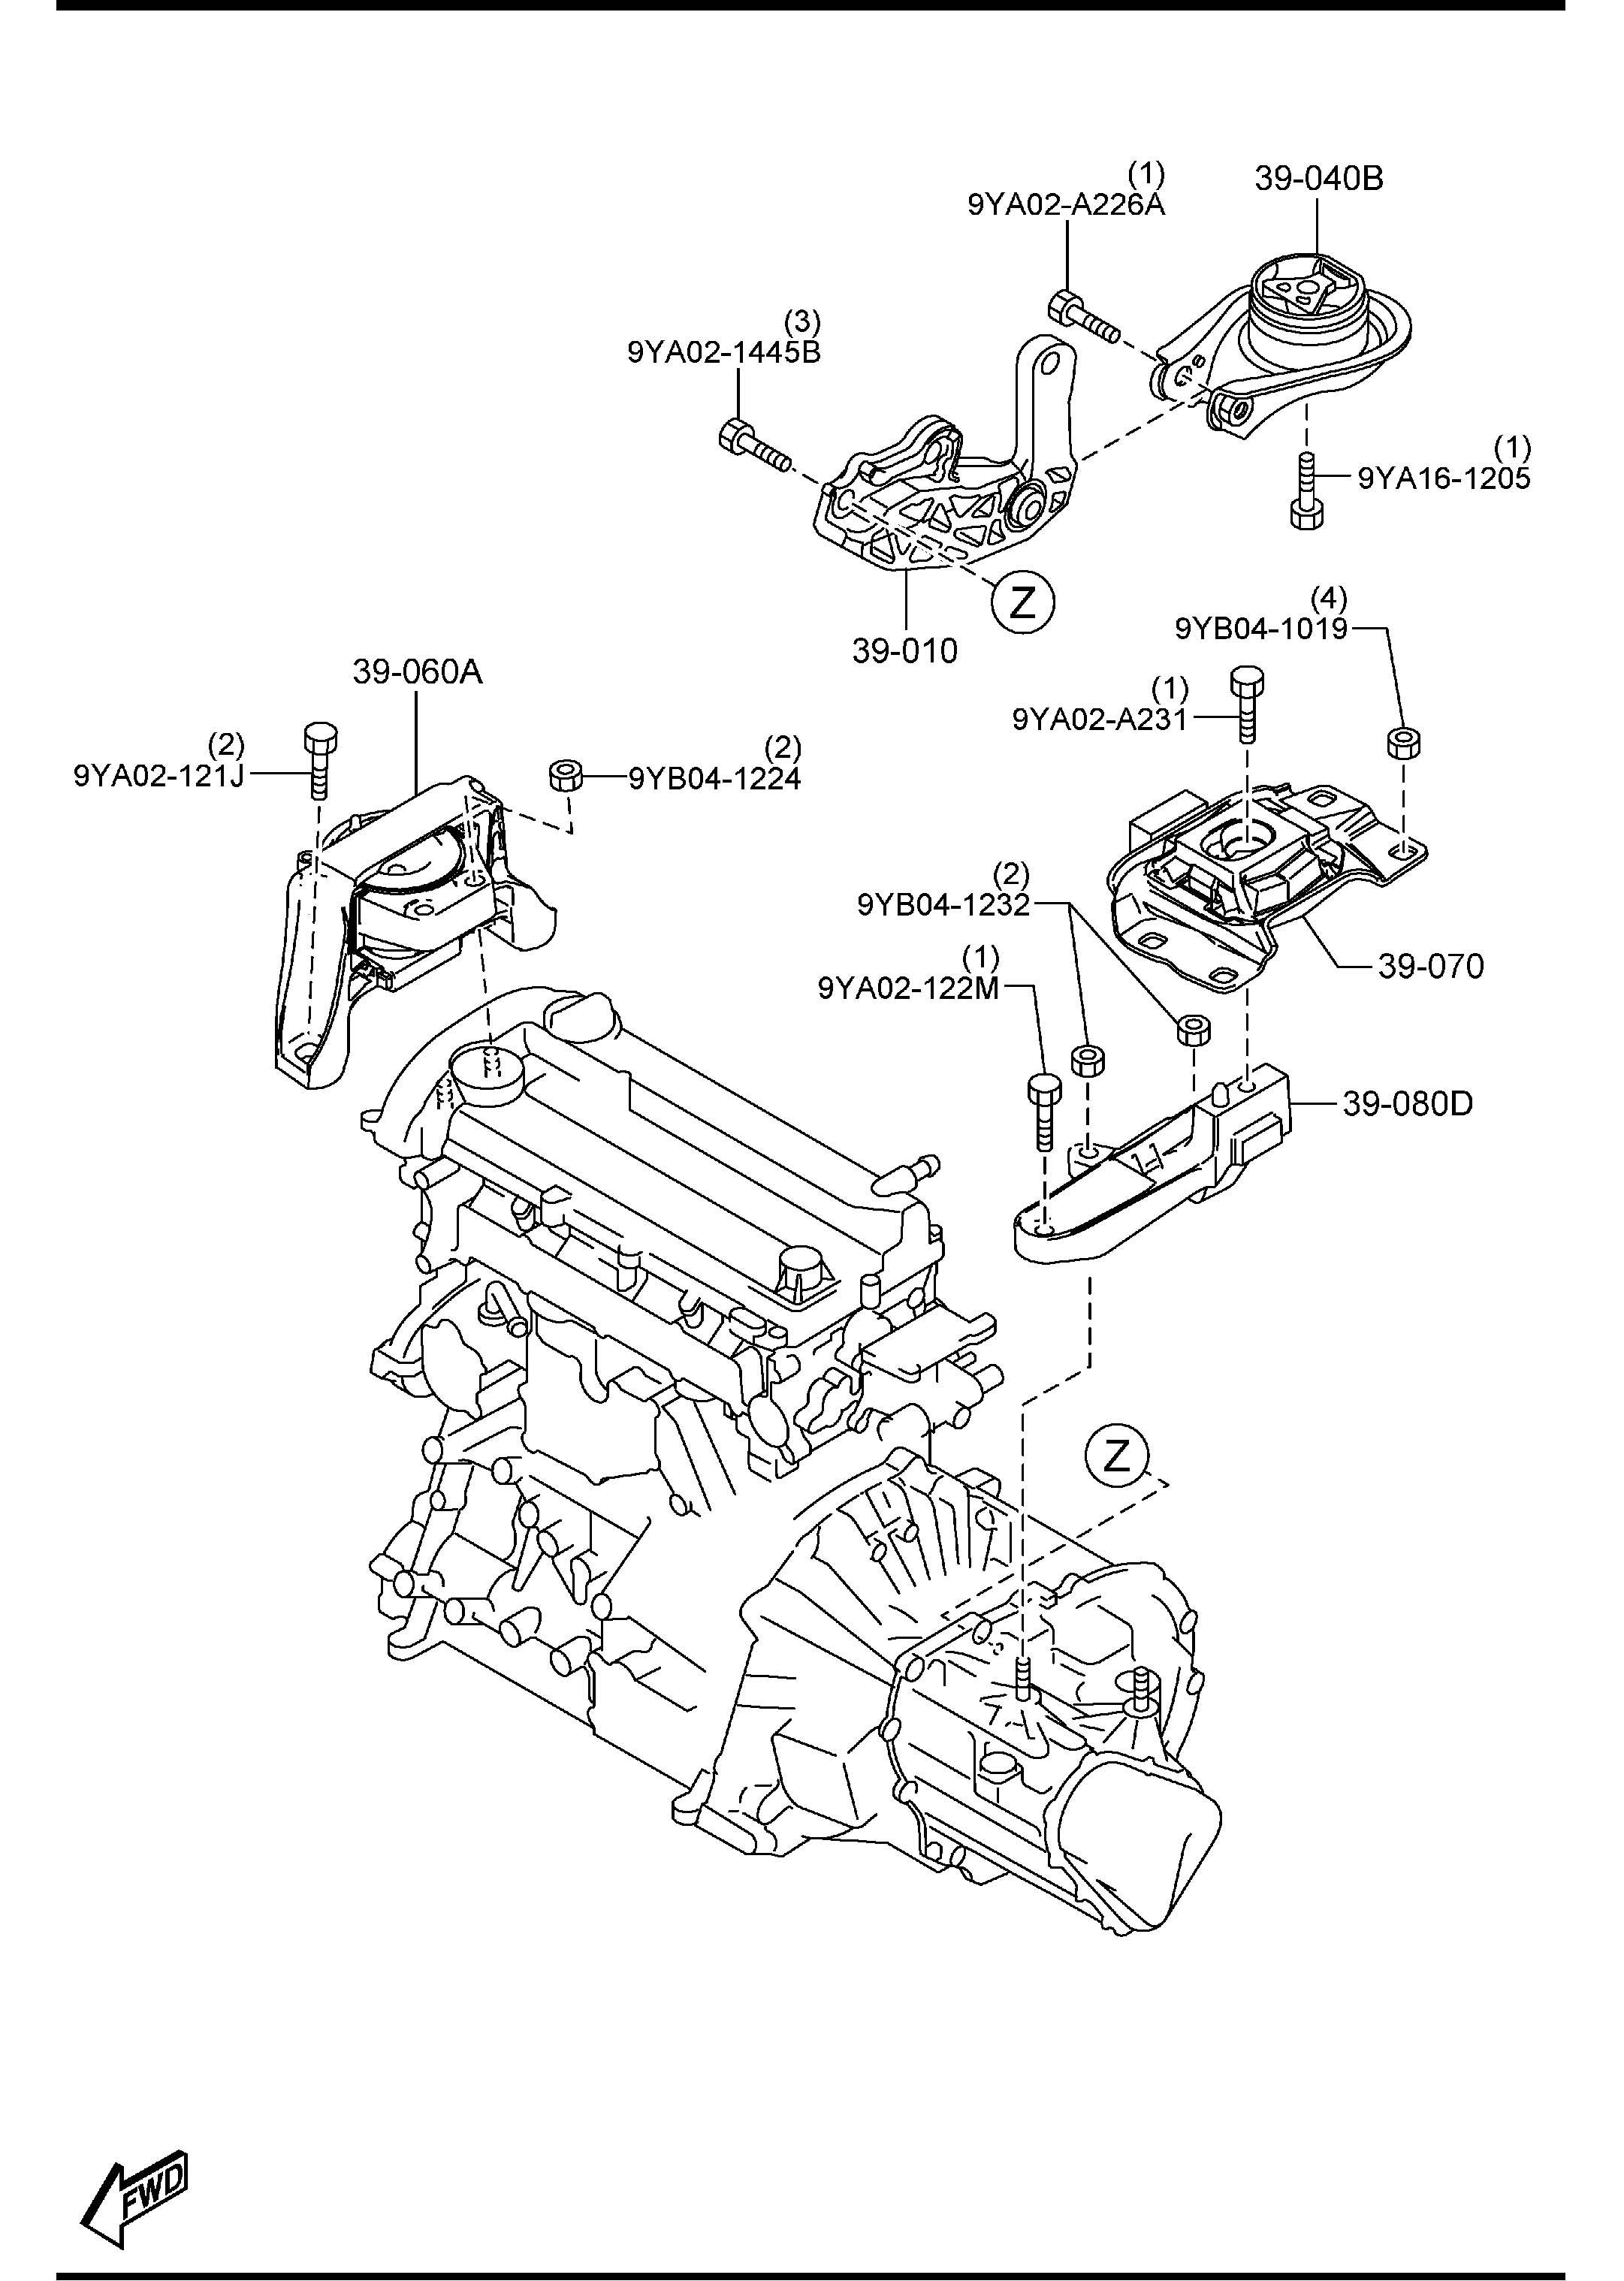 M38a1 Transmission Mounts | Wiring Diagram Database on dodge light switch diagram, jeep light switch diagram, cj7 light switch diagram, cj5 light switch diagram, cj light switch diagram,